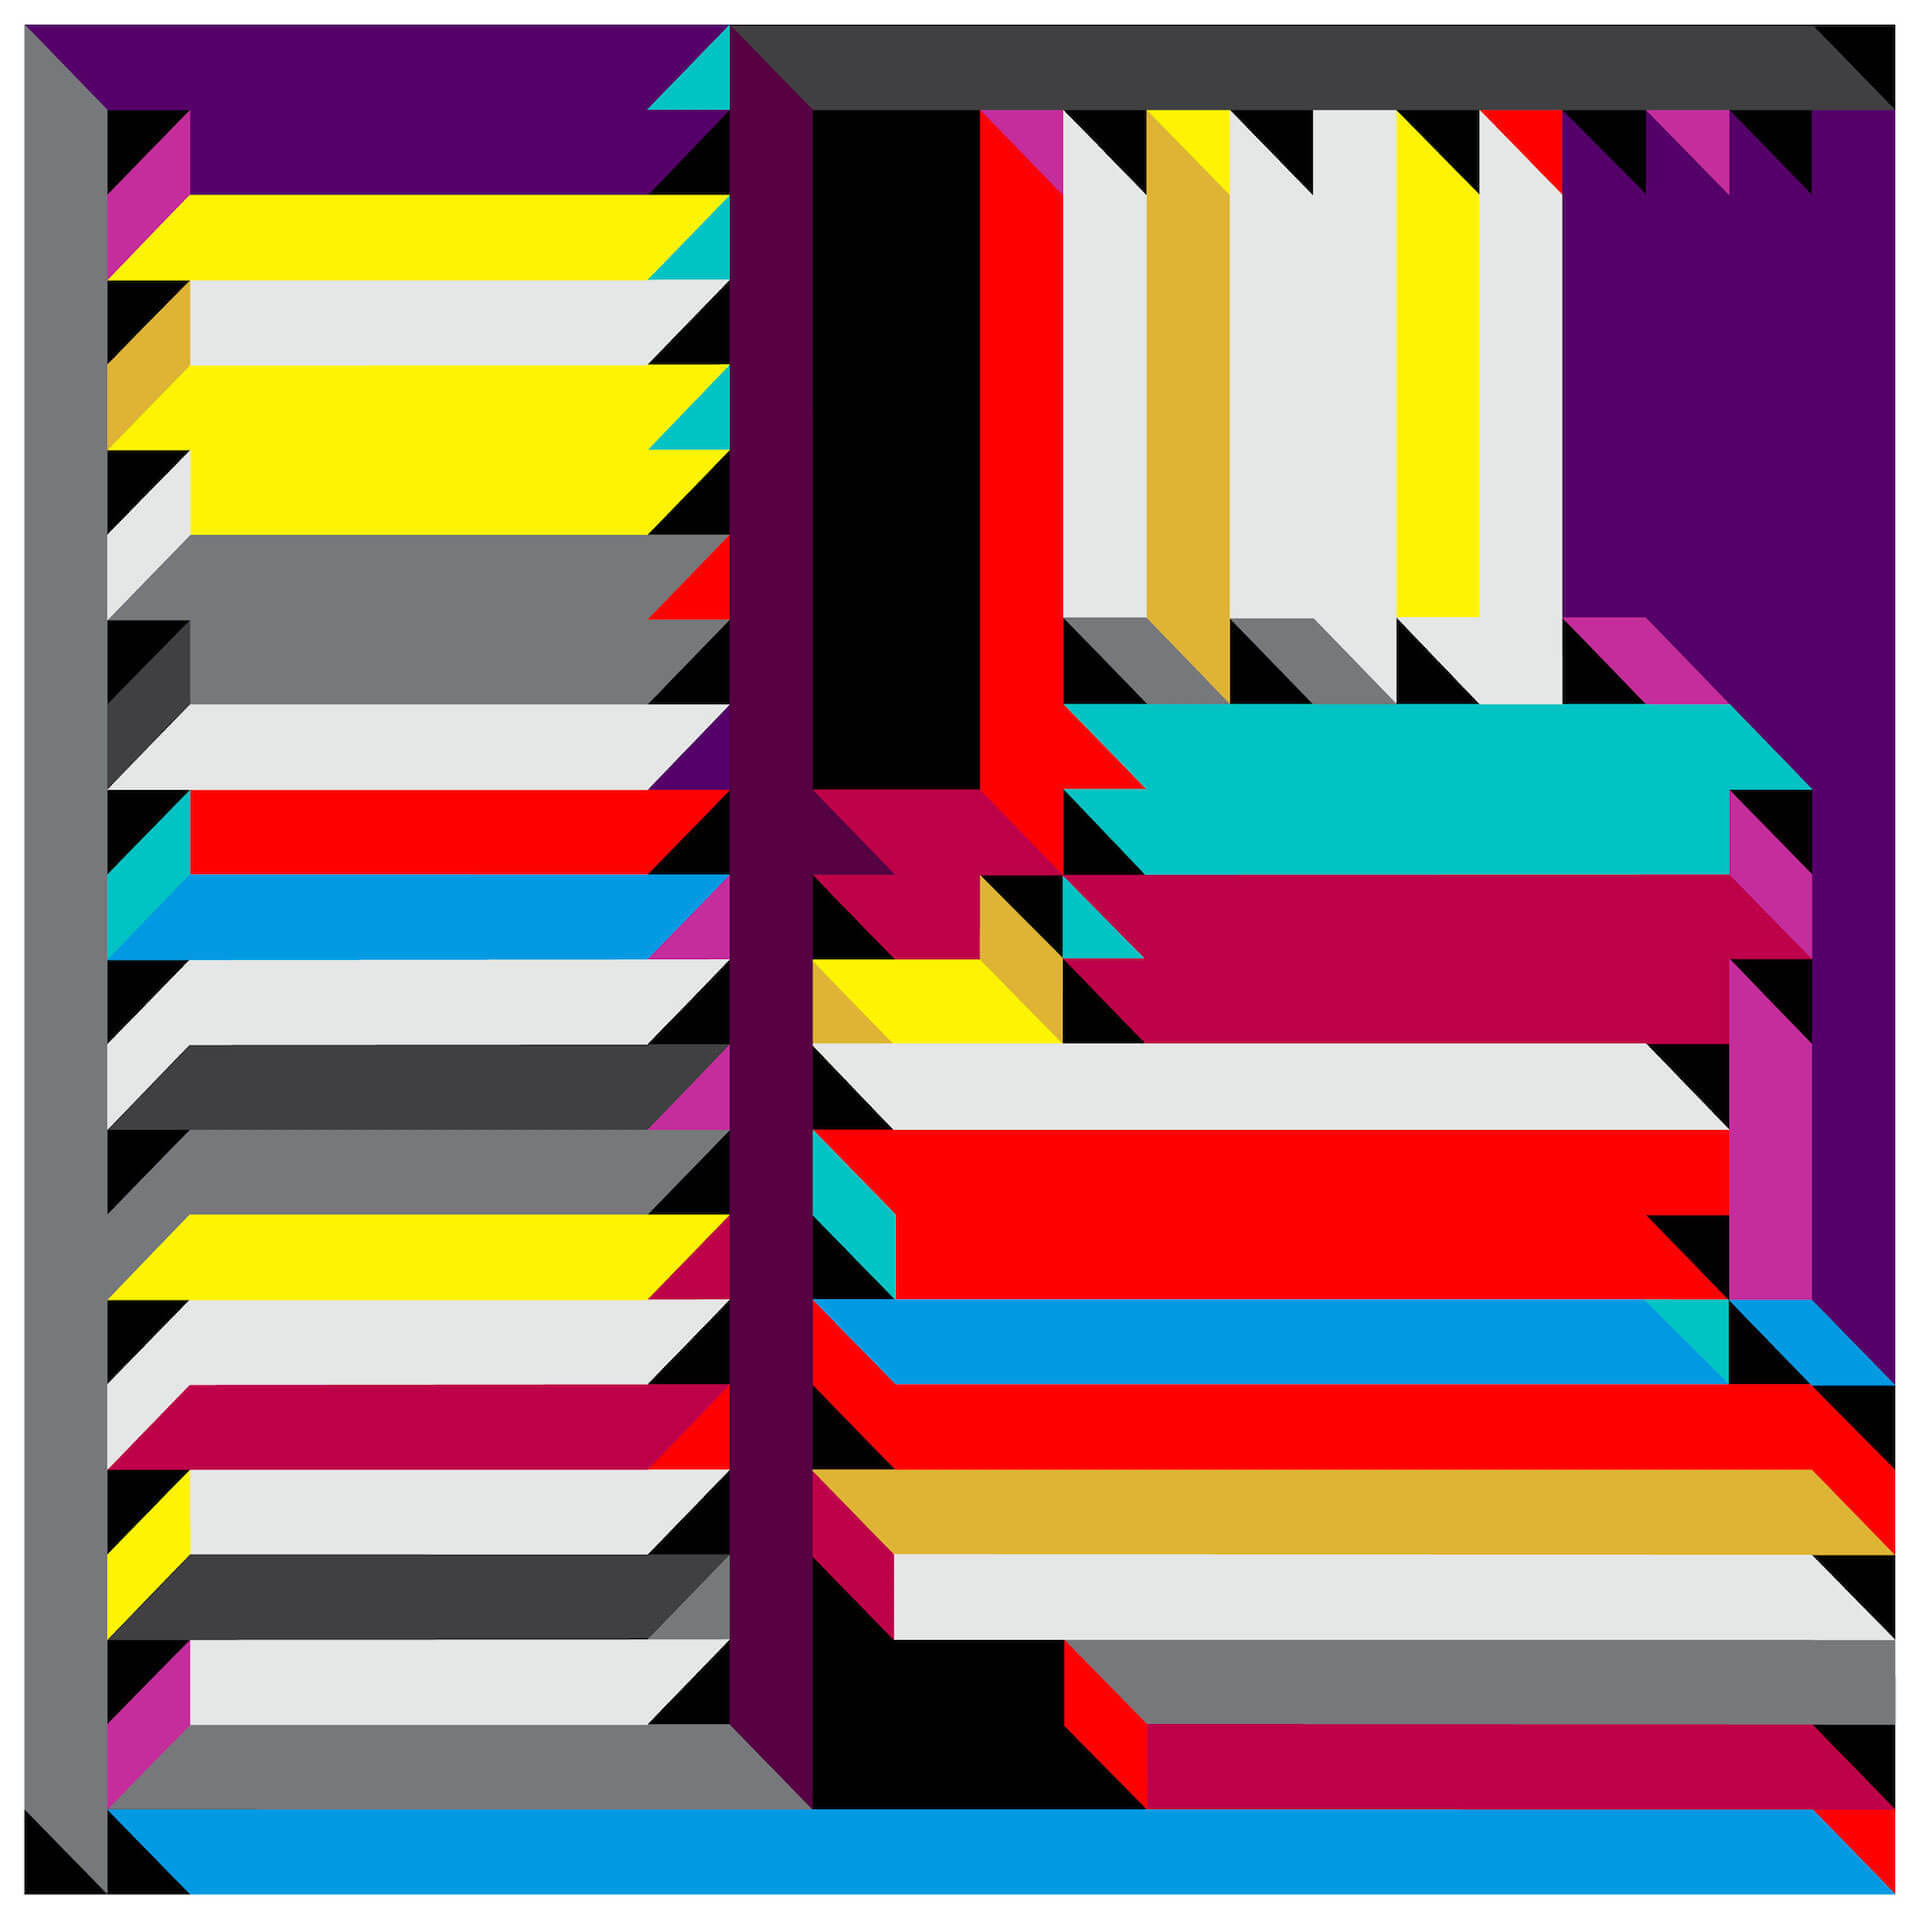 BATTLES最新アルバムの世界最速プレミア爆音試聴会の開催が決定!全国ツアーチケットも発売中 music191001_battles_4